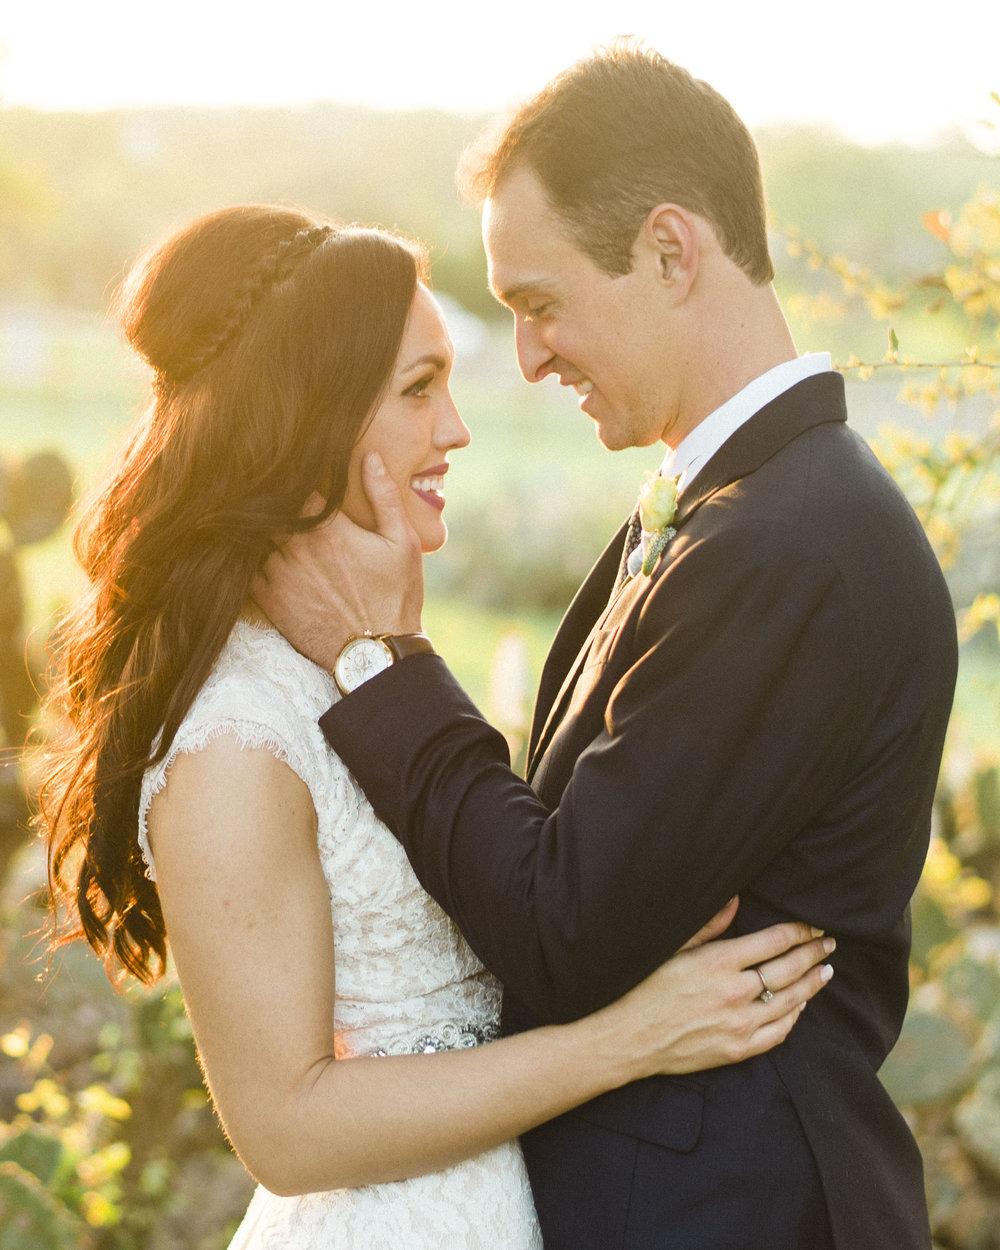 beautiful wedding photography.JPG